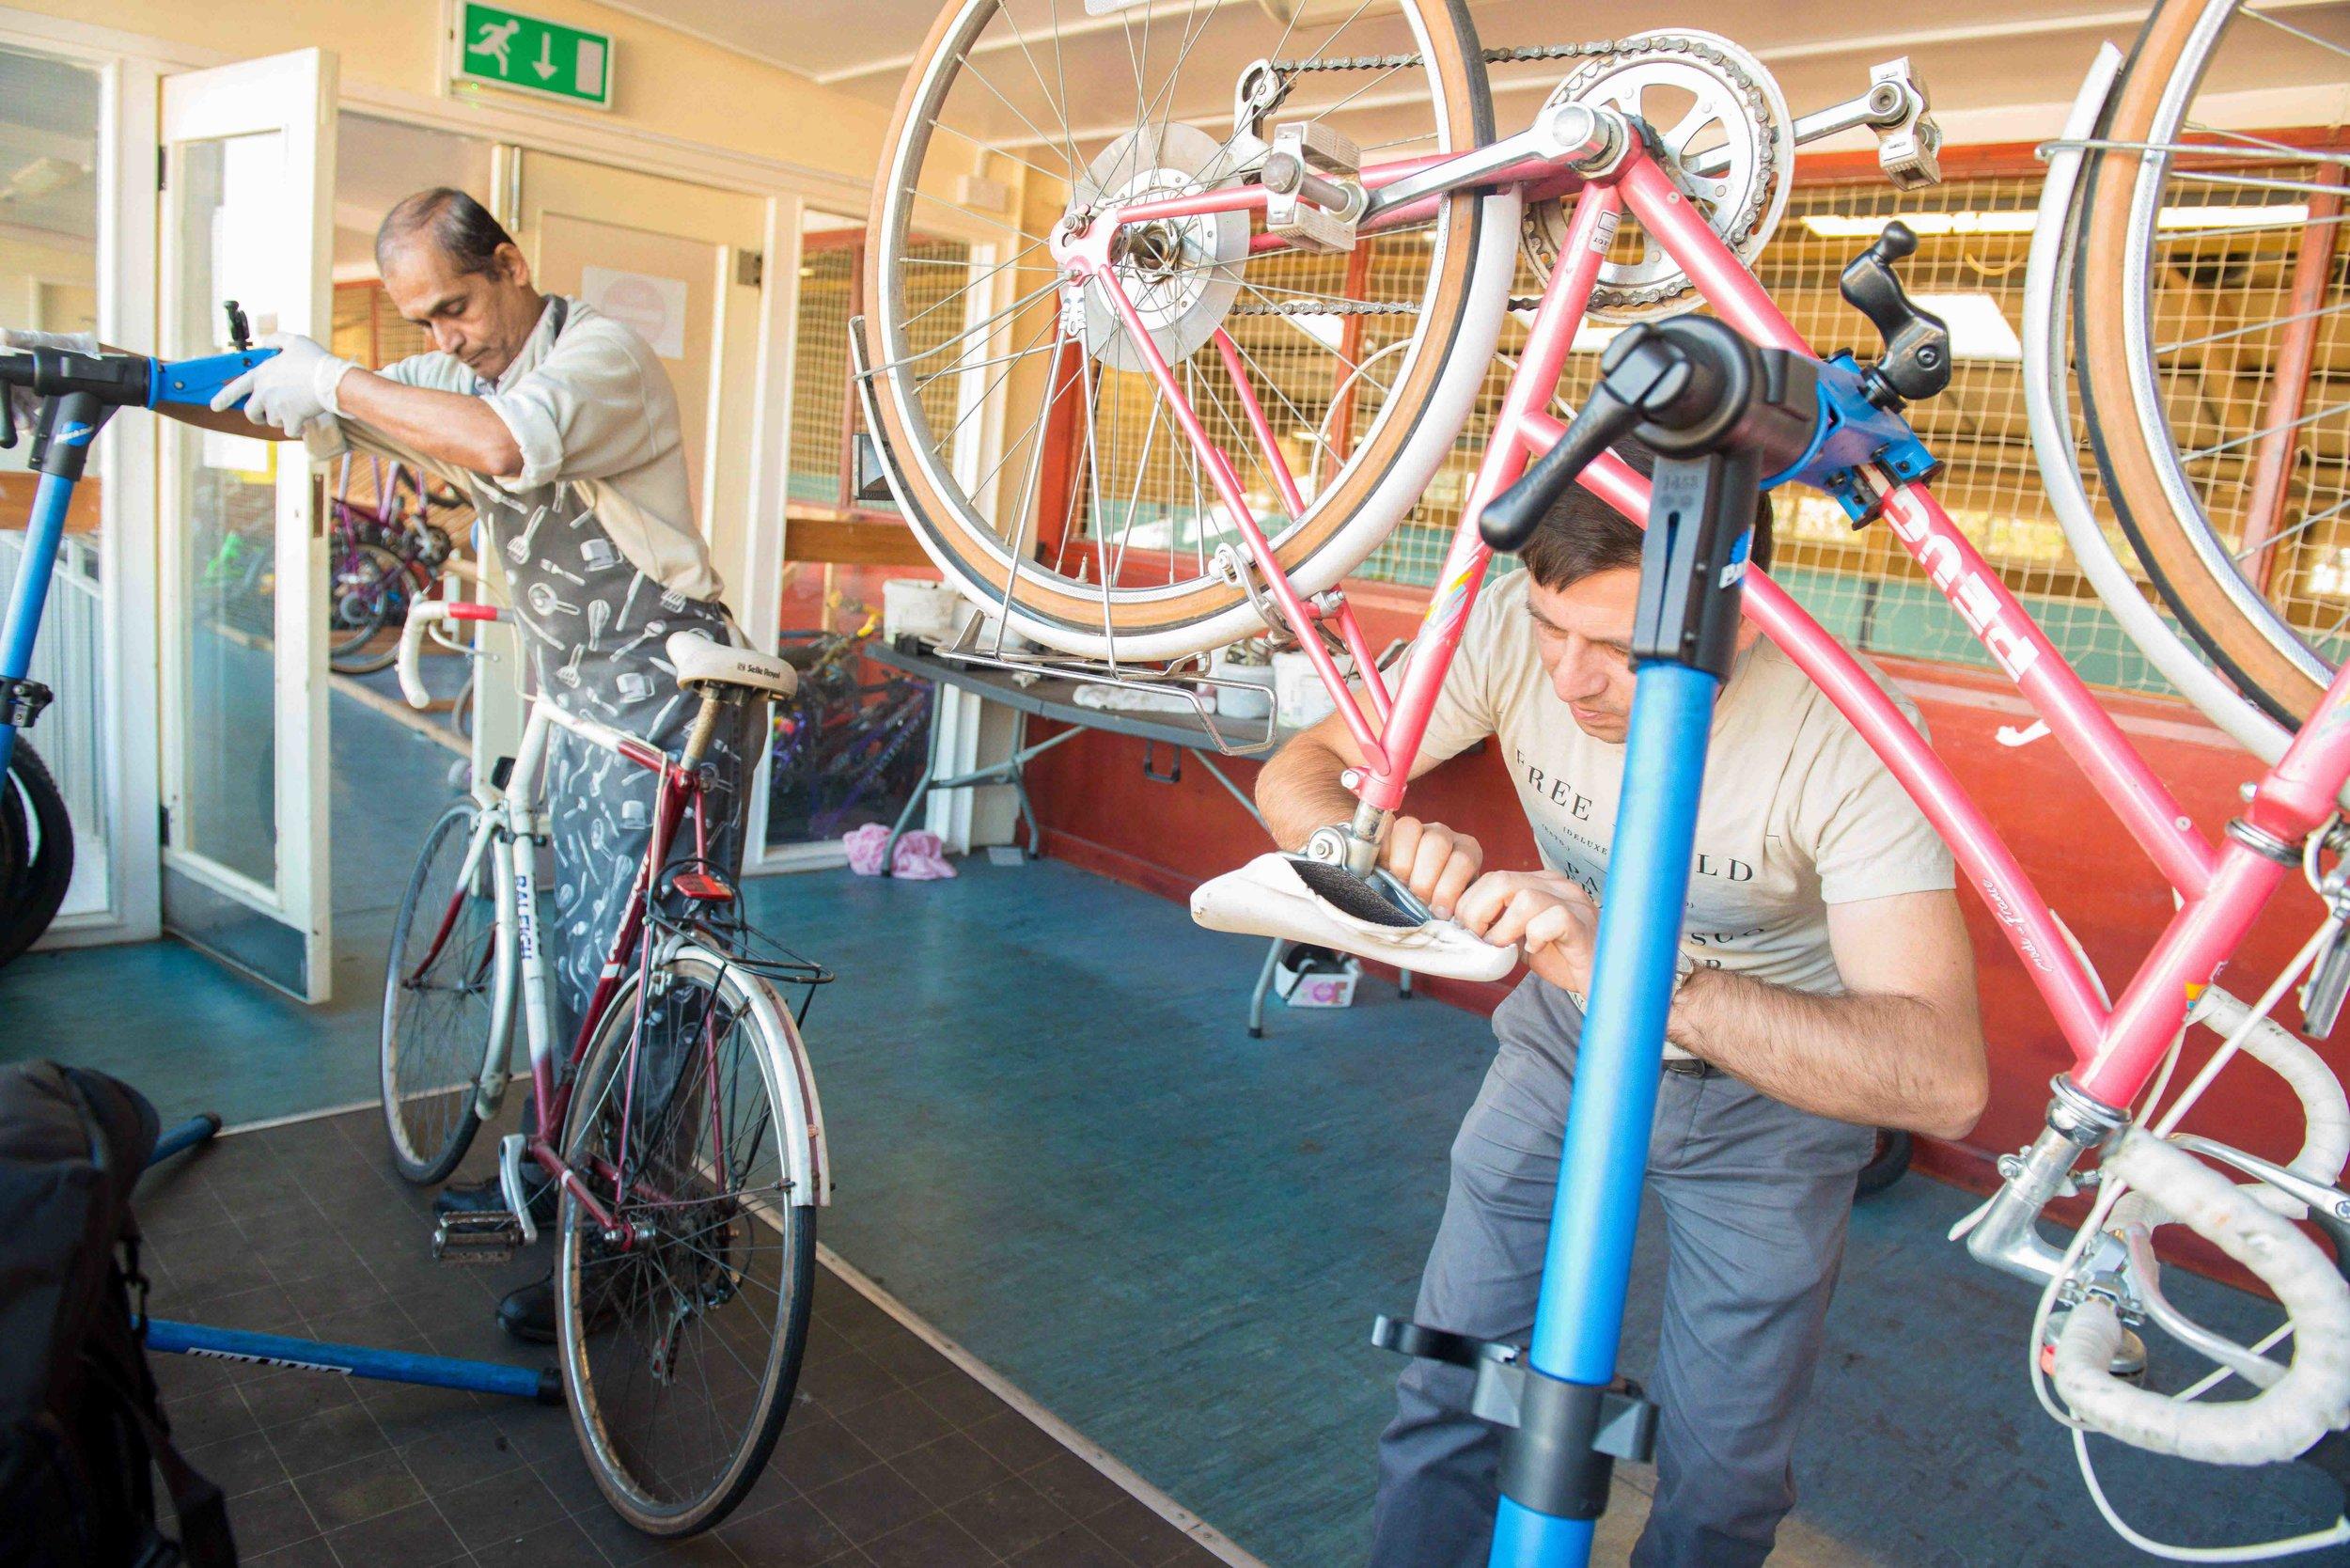 Bike Library - 16th November 2017, Parkside Centre, Bradford